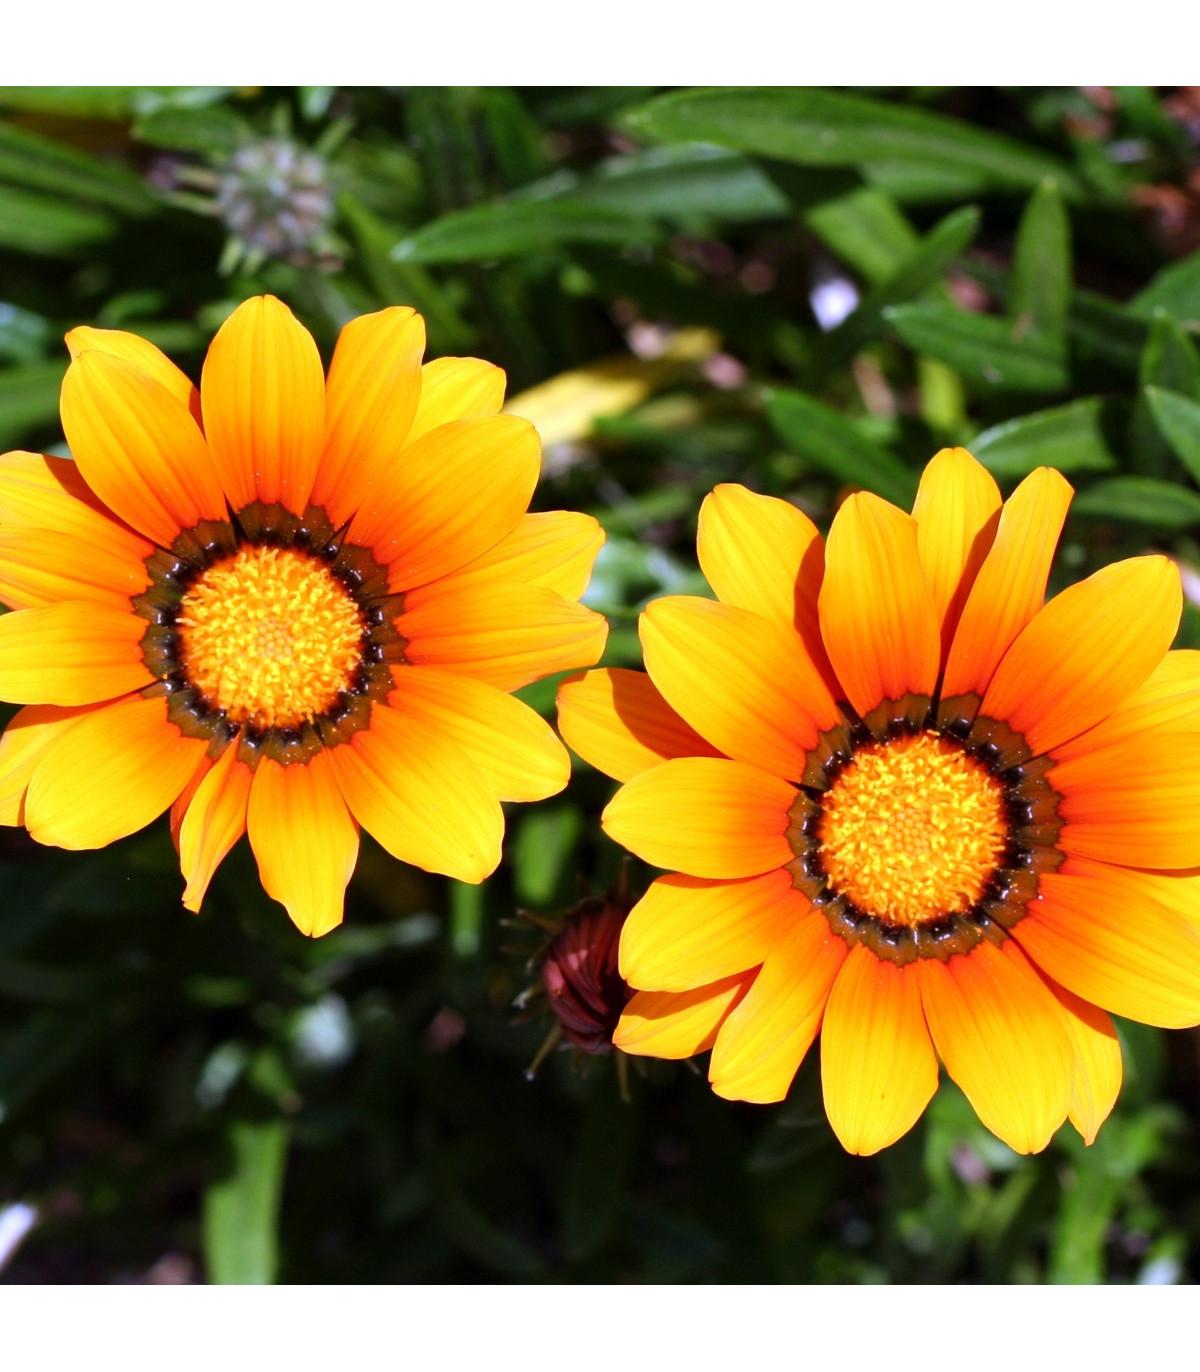 Kopretina kylnatá směs barev - chrysanthemum carinatum - osivo kopretiny - 0,3 g